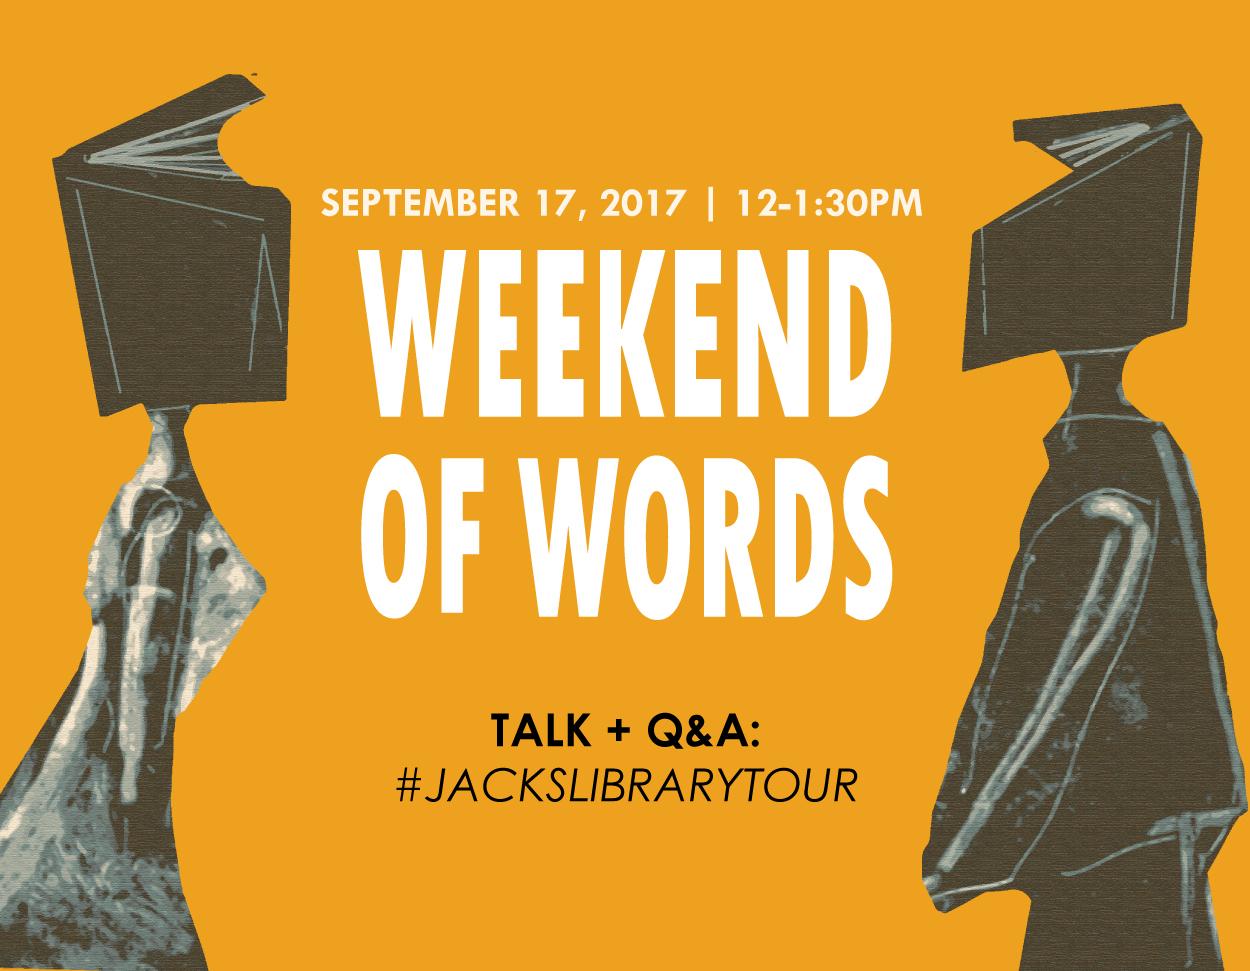 Talk + Q&A: #JacksLibraryTour